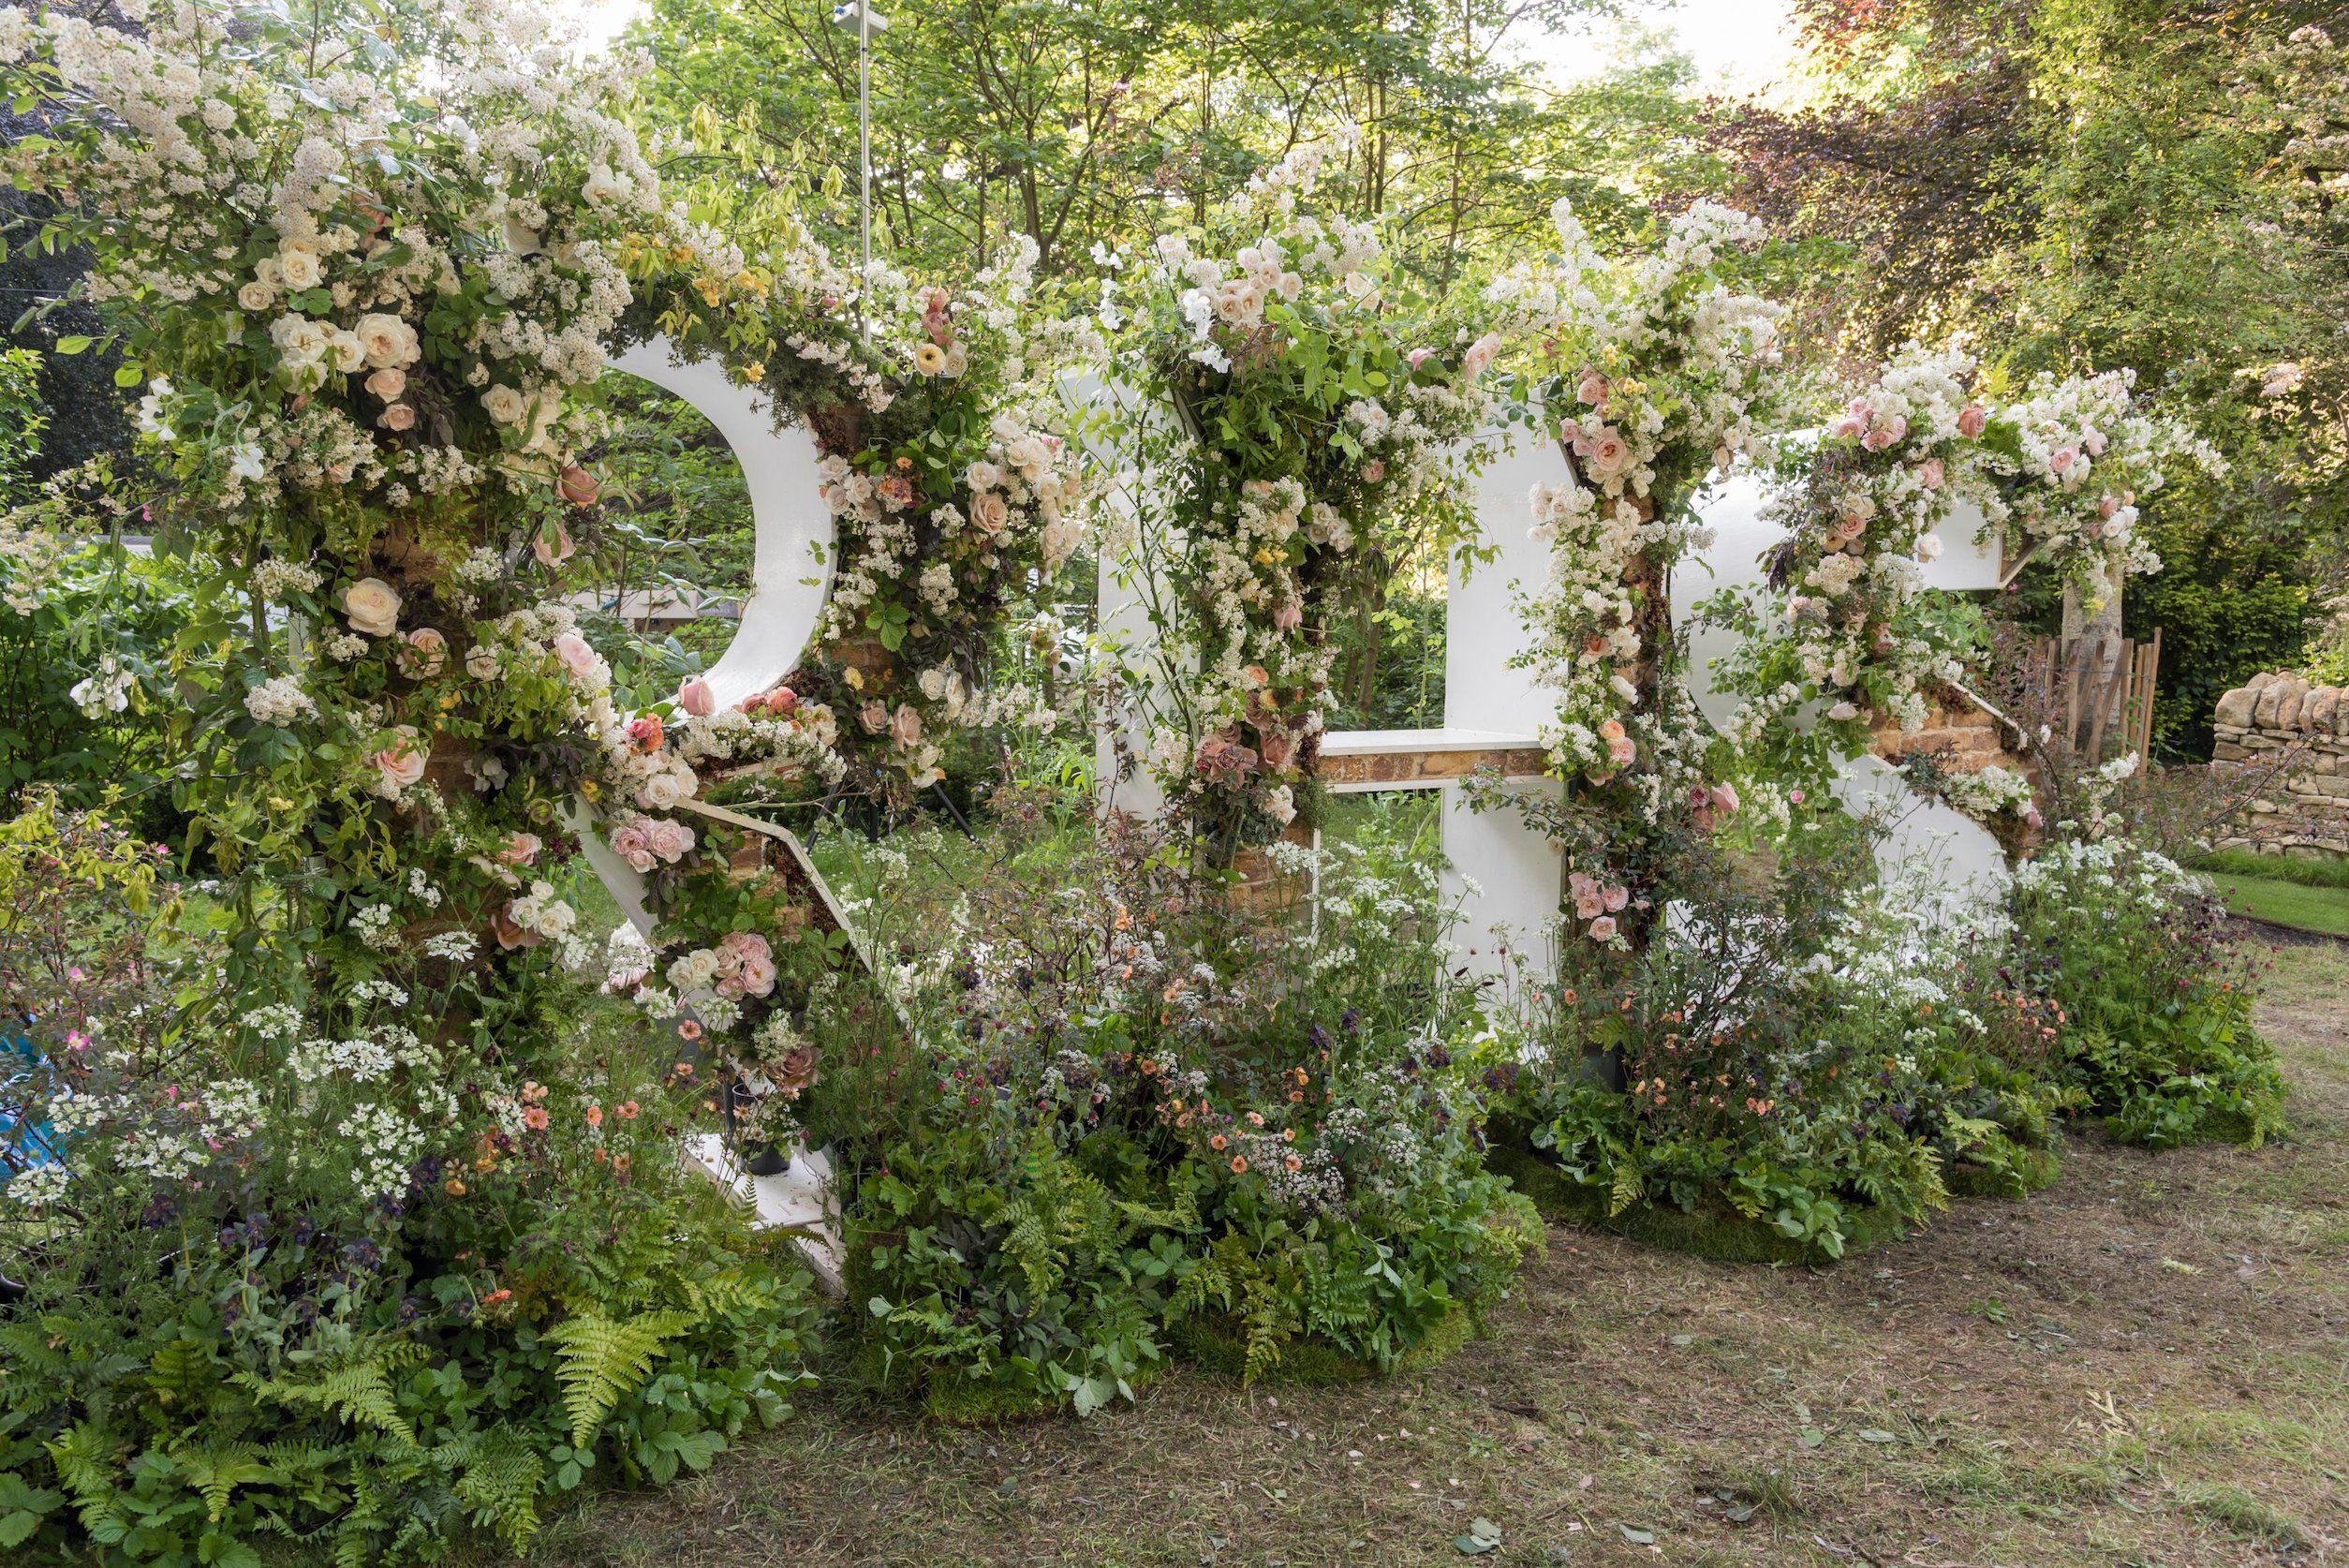 chelsea flower show 2019: london gate main entrance design